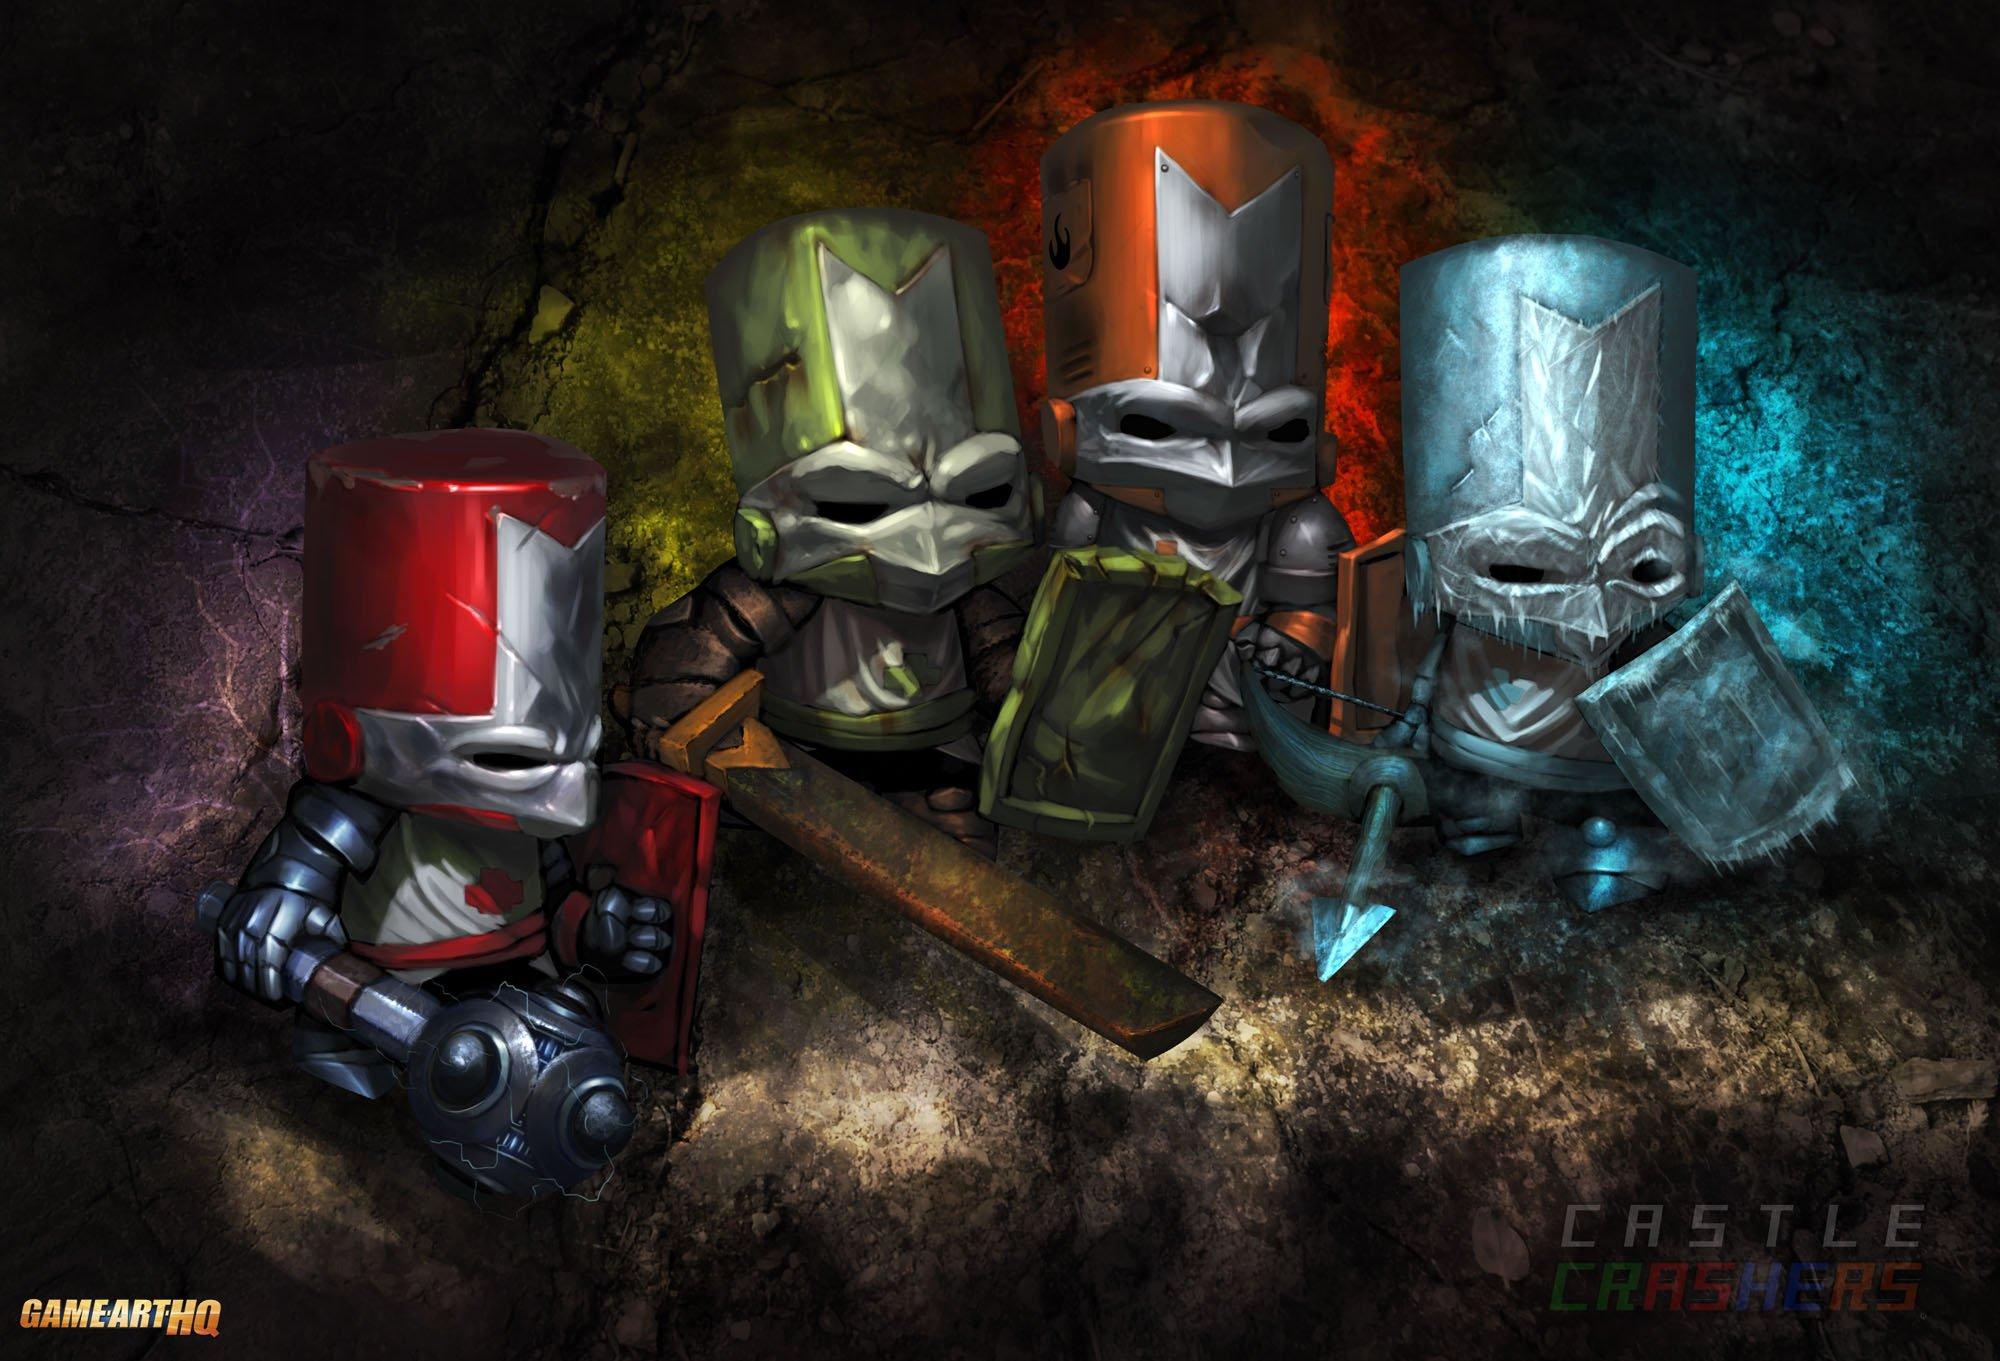 castle crashers fighting action rpg fantasy scrolling